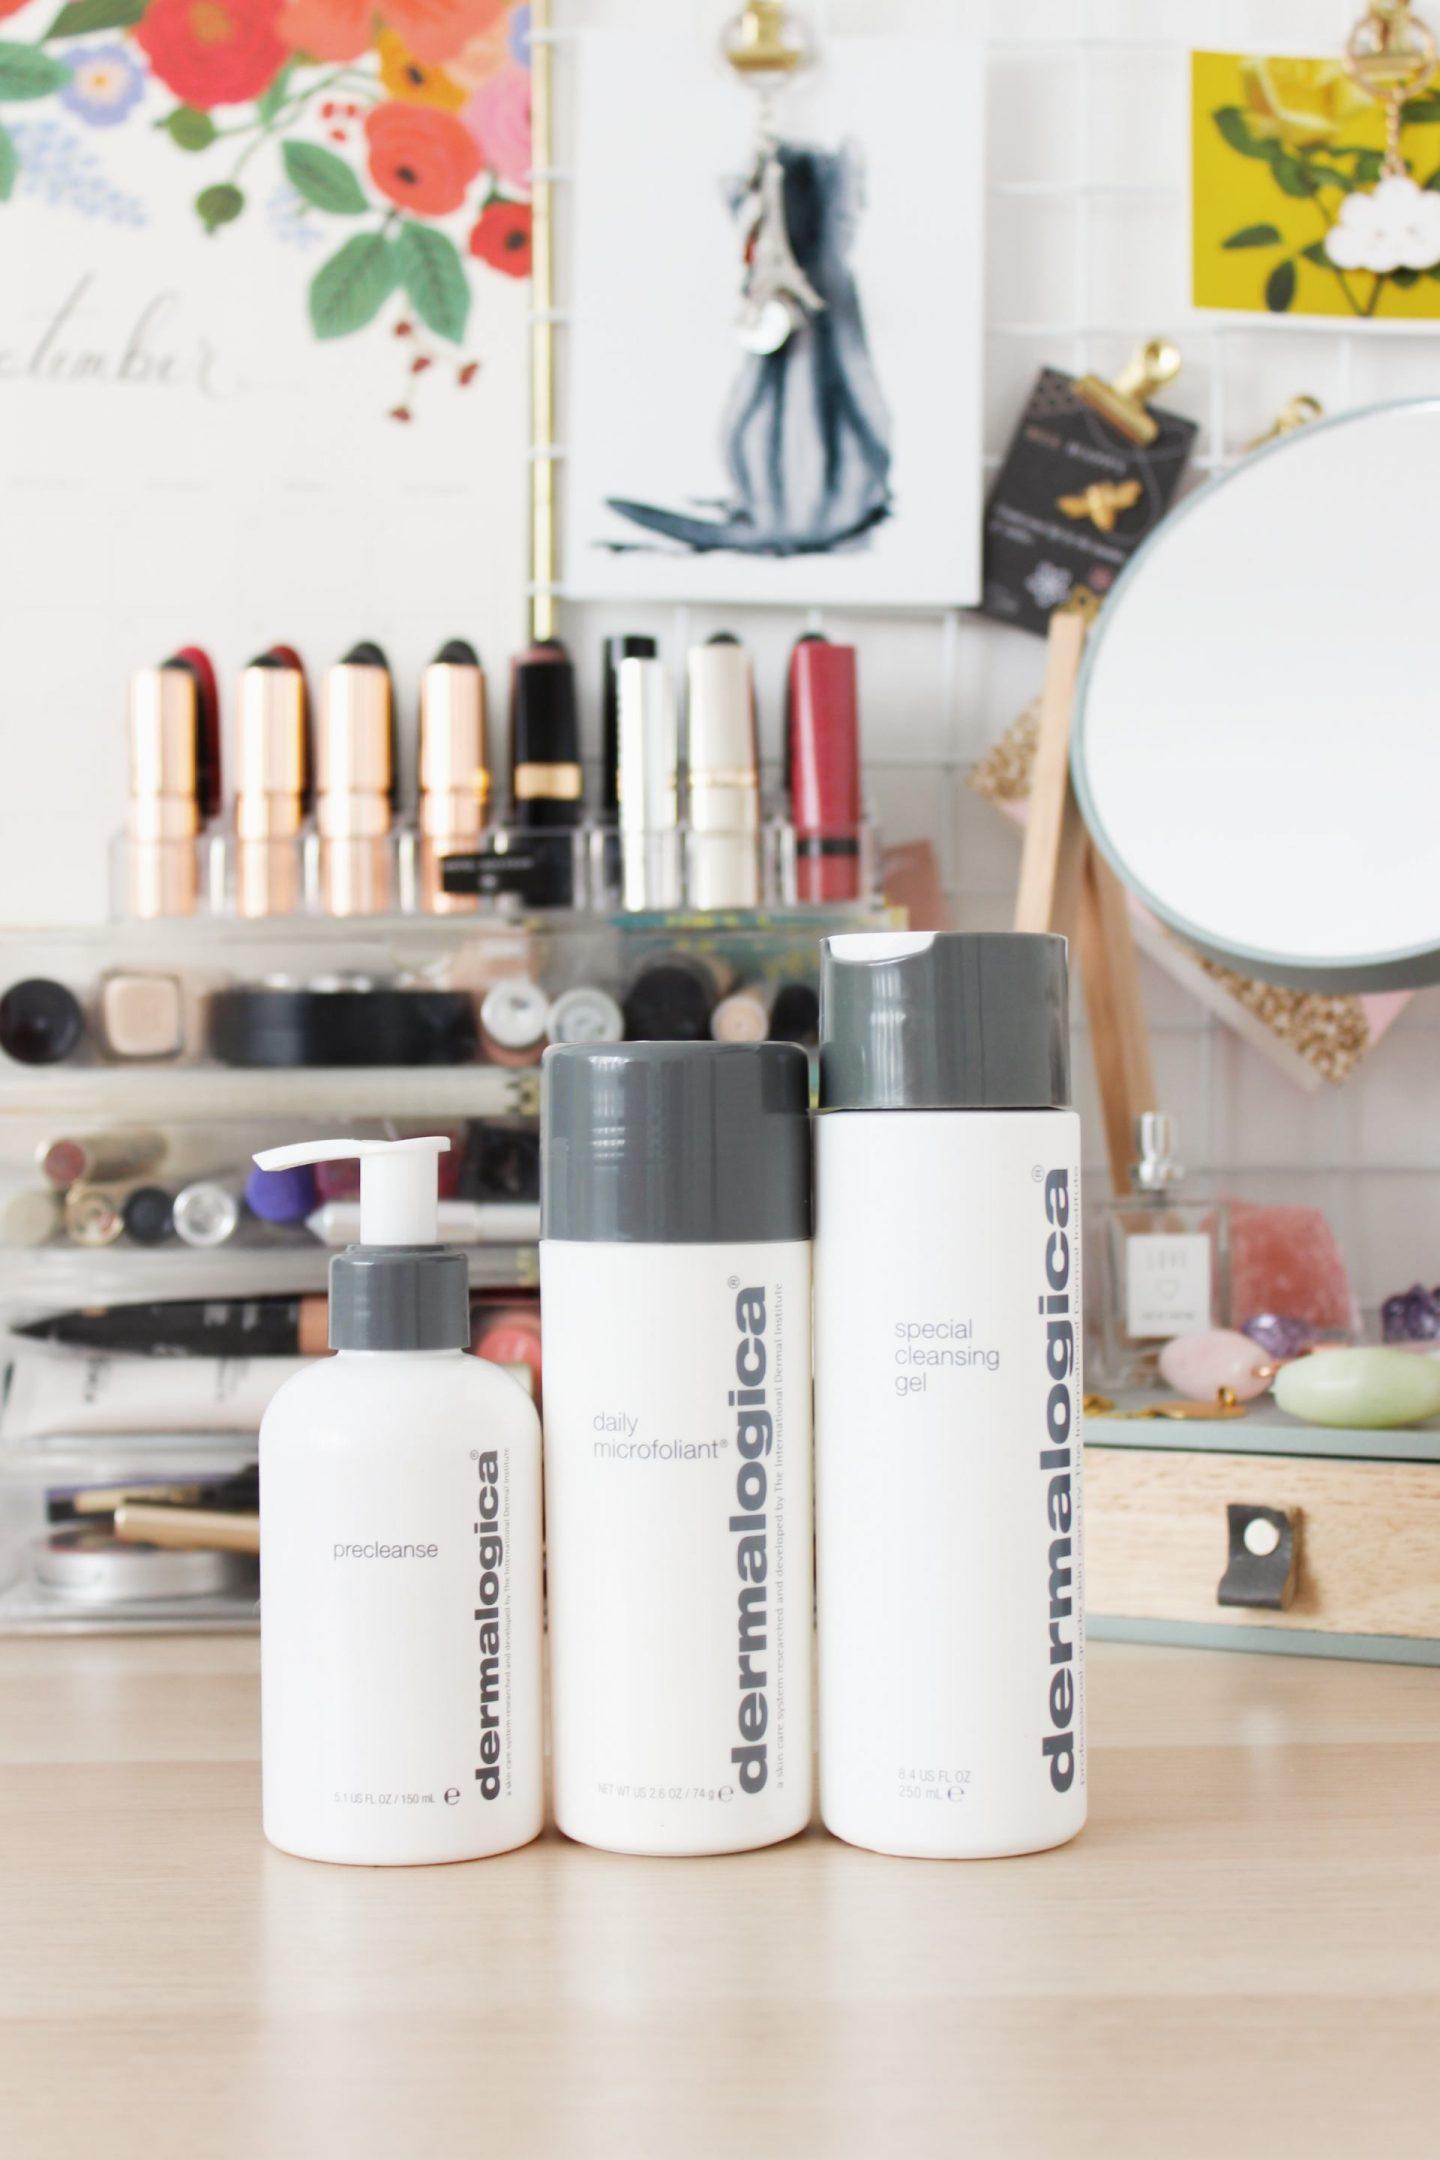 Trialling Dermalogica Skincare